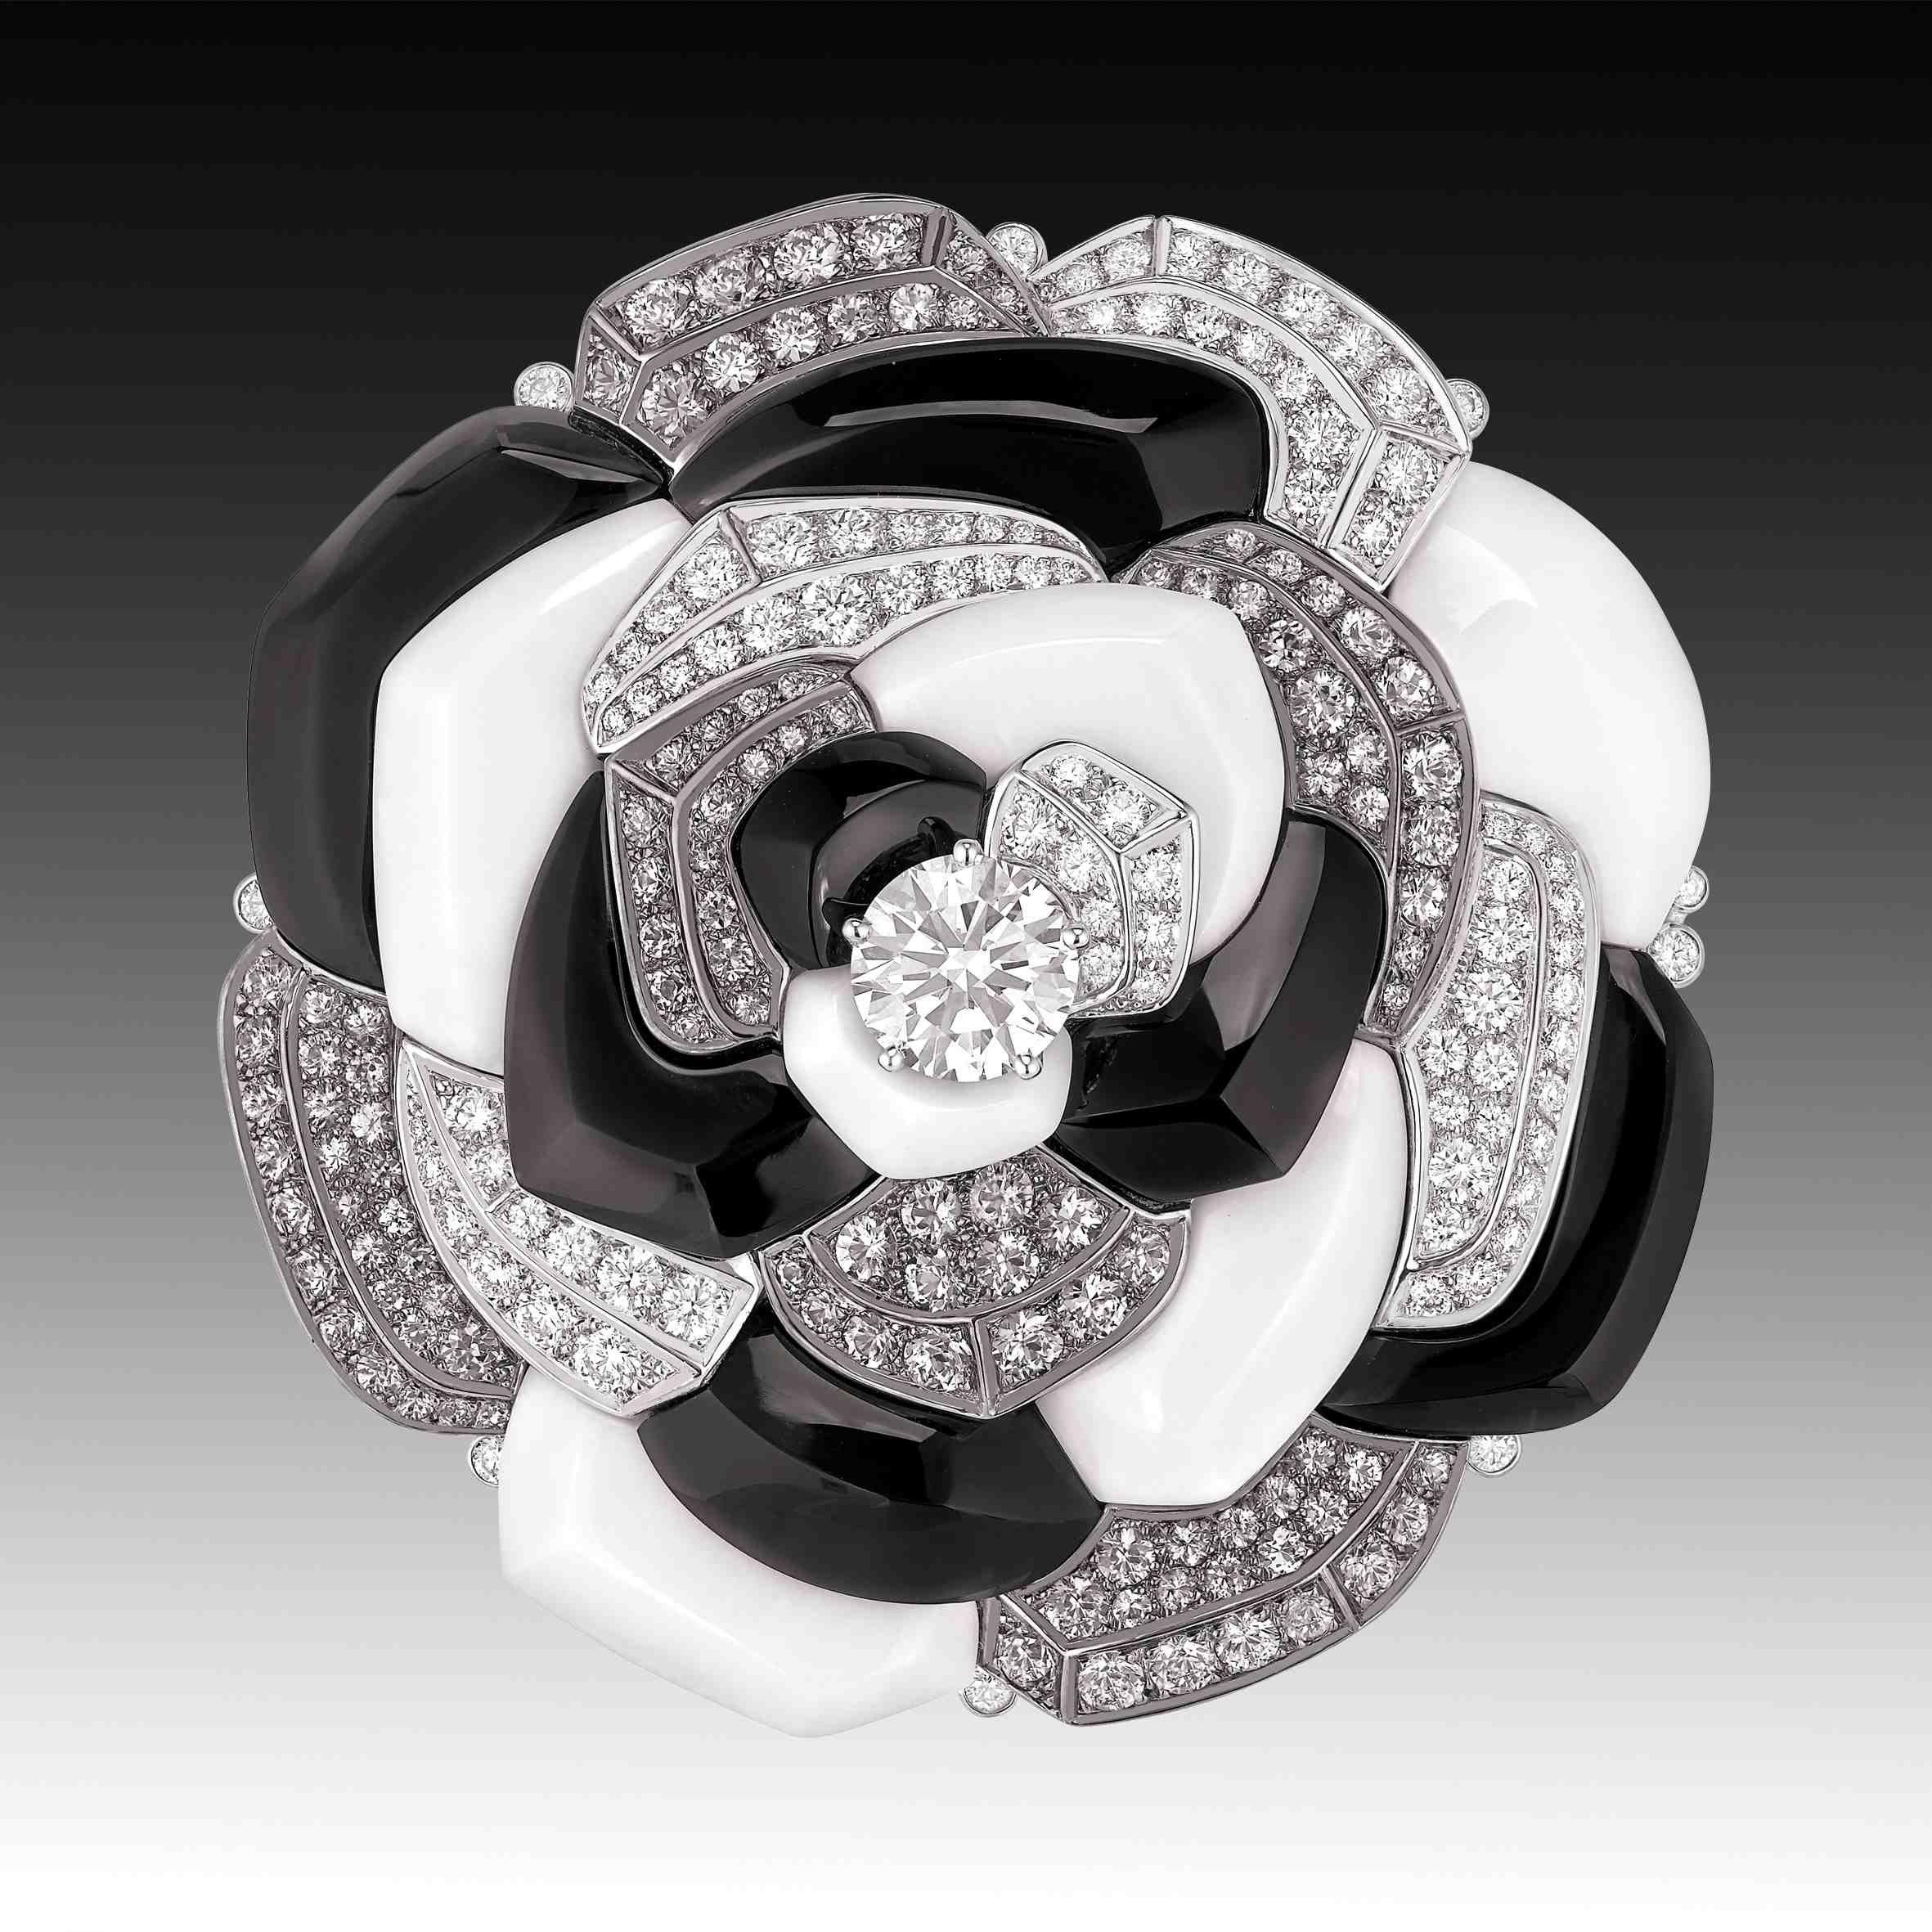 Chanel Fine Jewellery Contraste de camelia ring